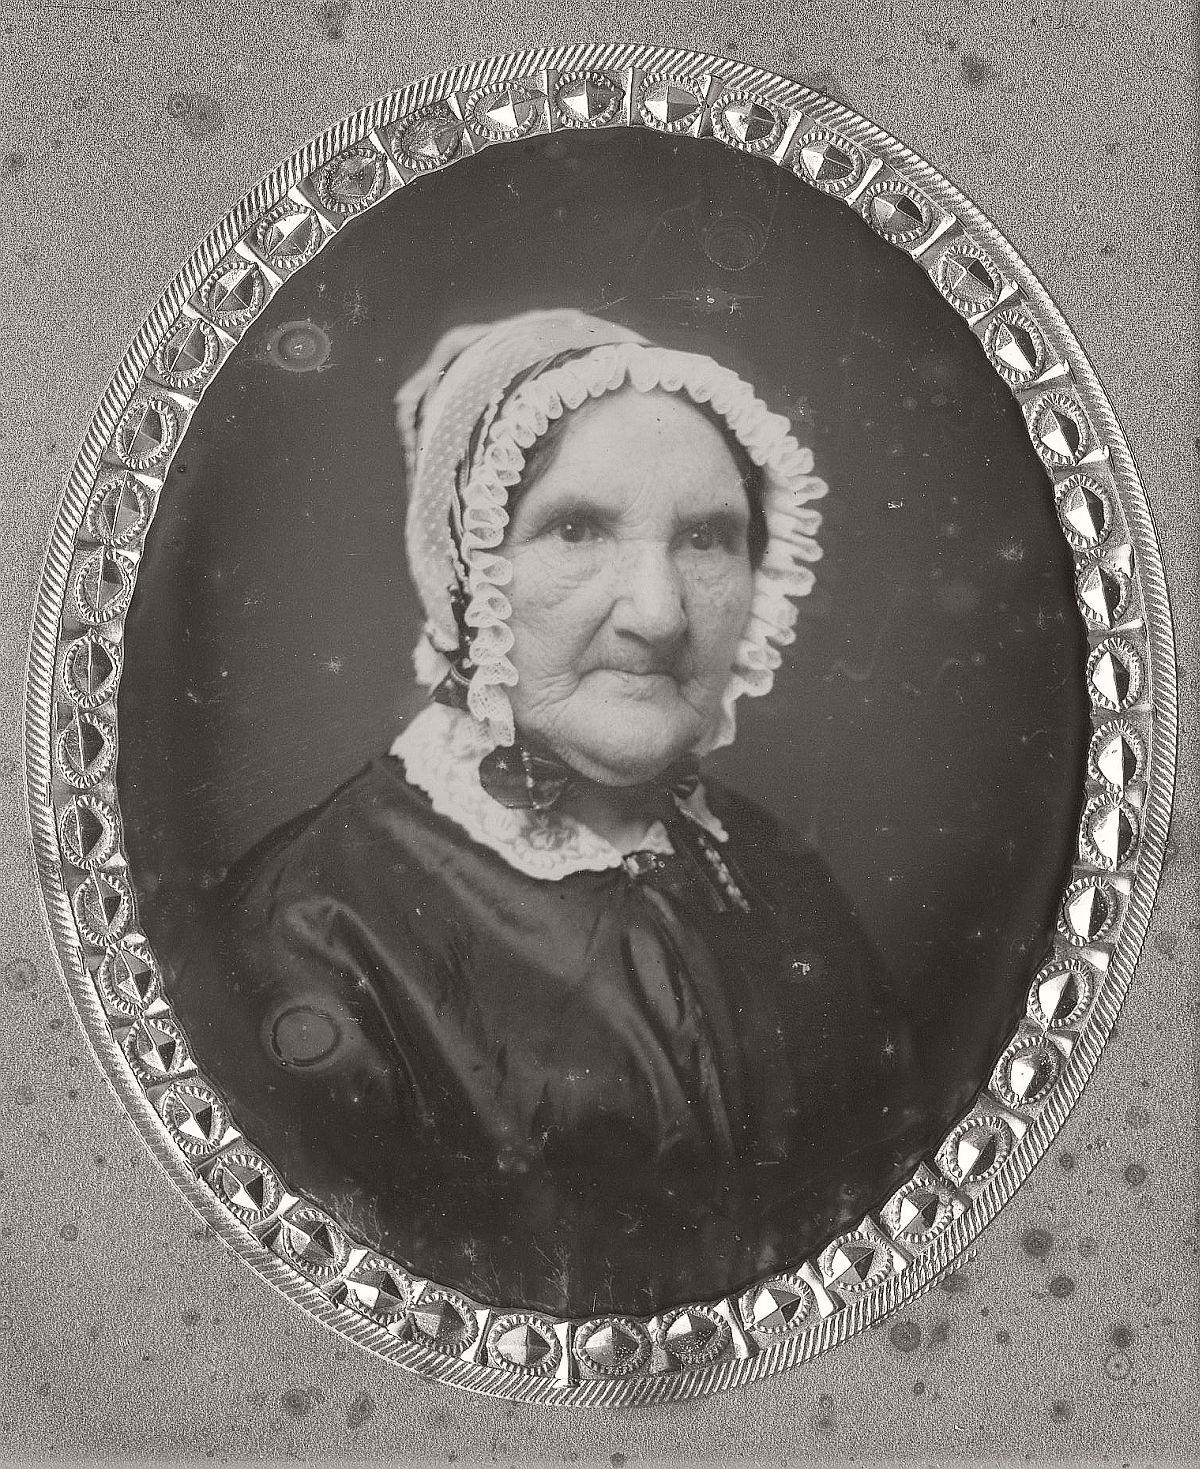 daguerreotype-portrait-ladies-born-in-the-late-18th-century-1700s-vintage-25